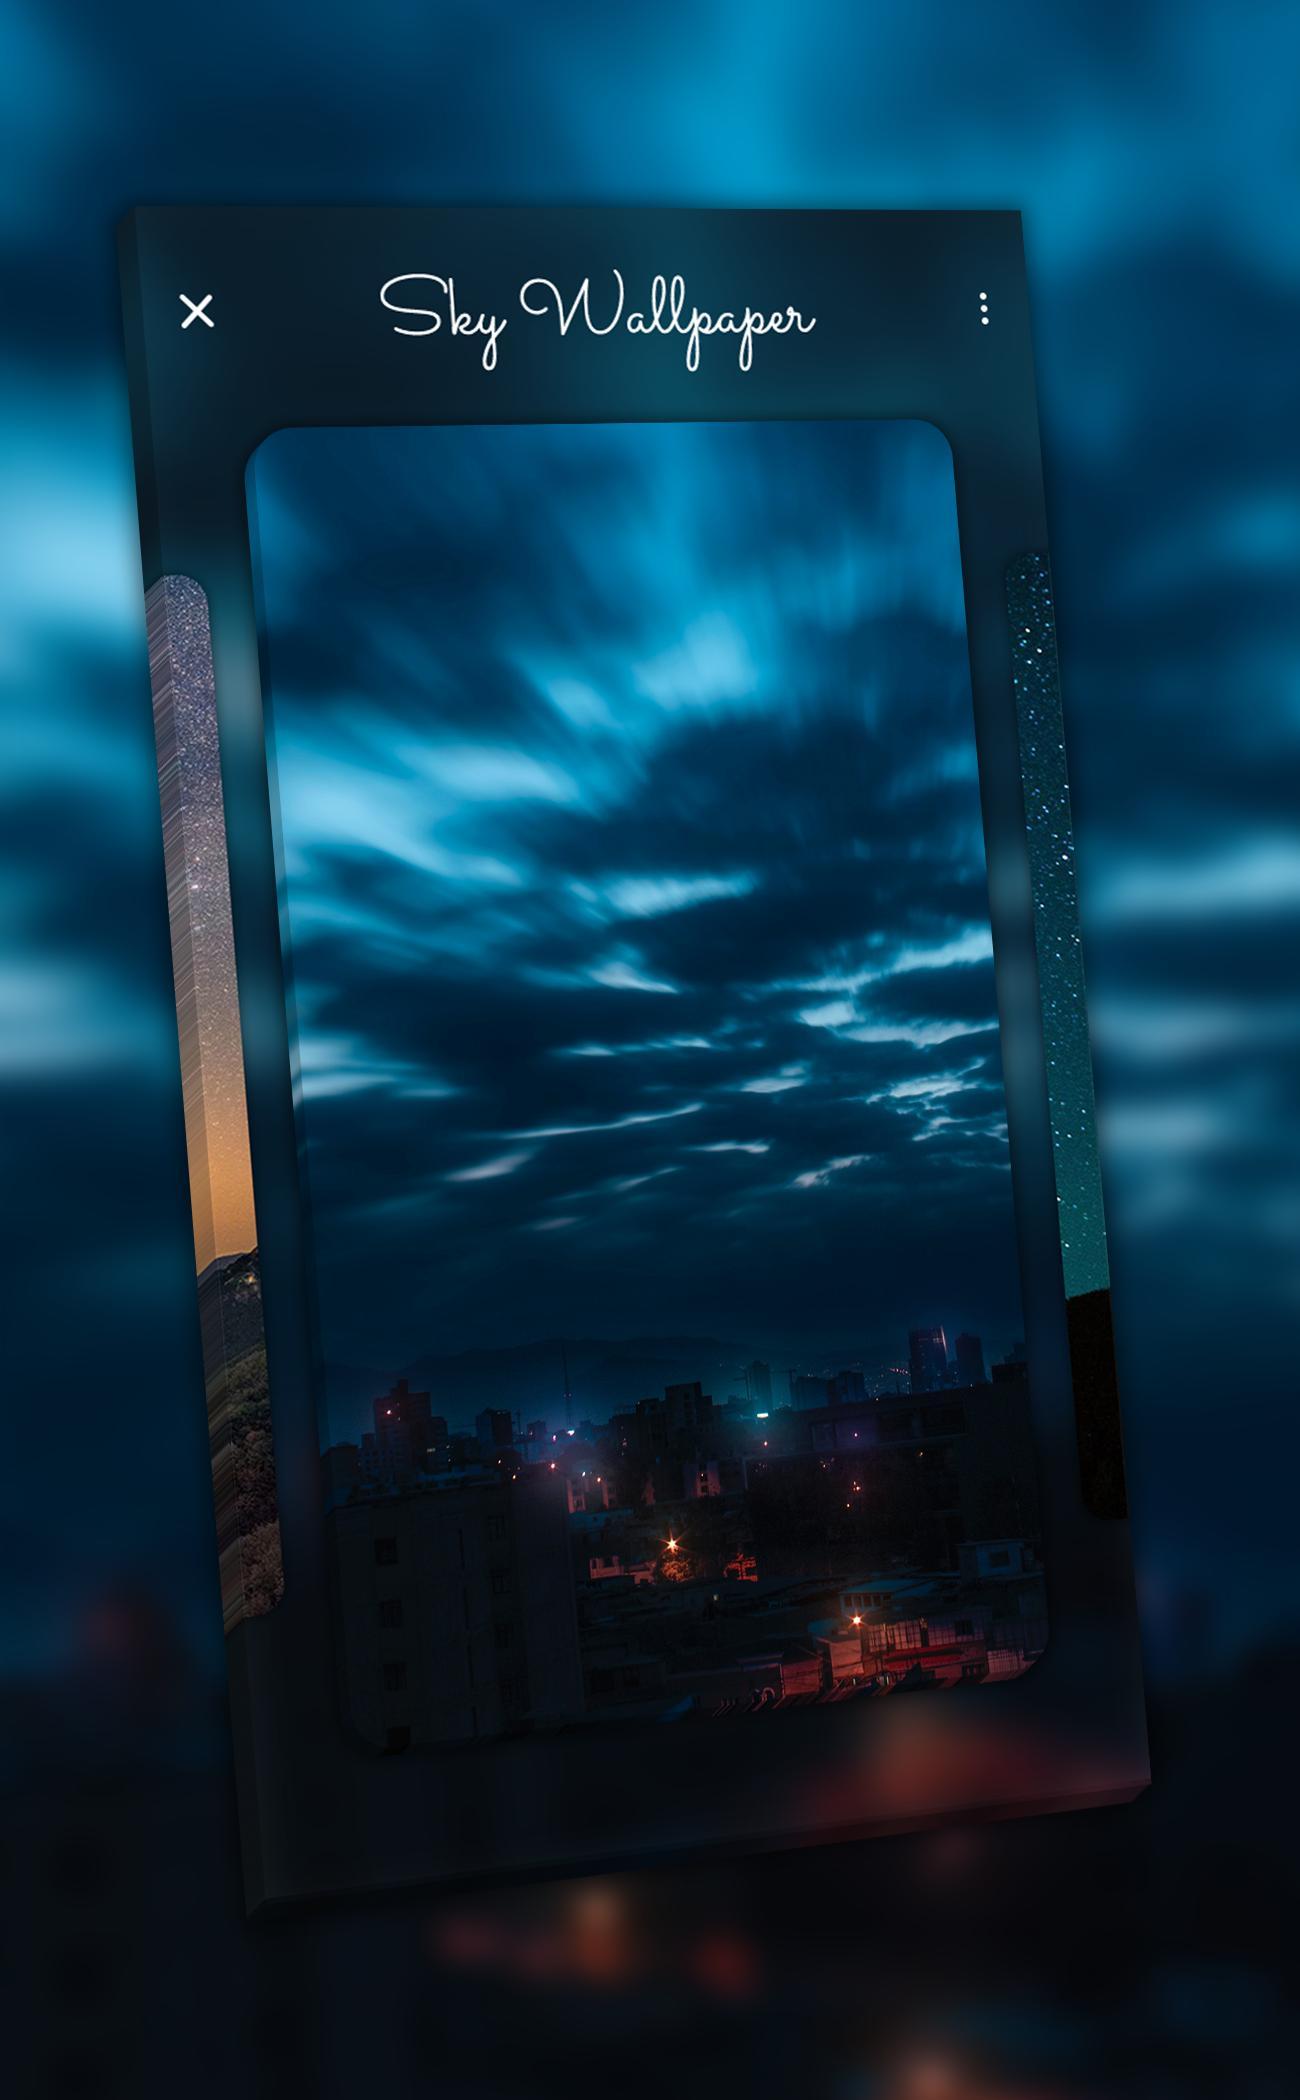 Sky Wallpaper 4k Hd Wallpaper For Android Apk Download